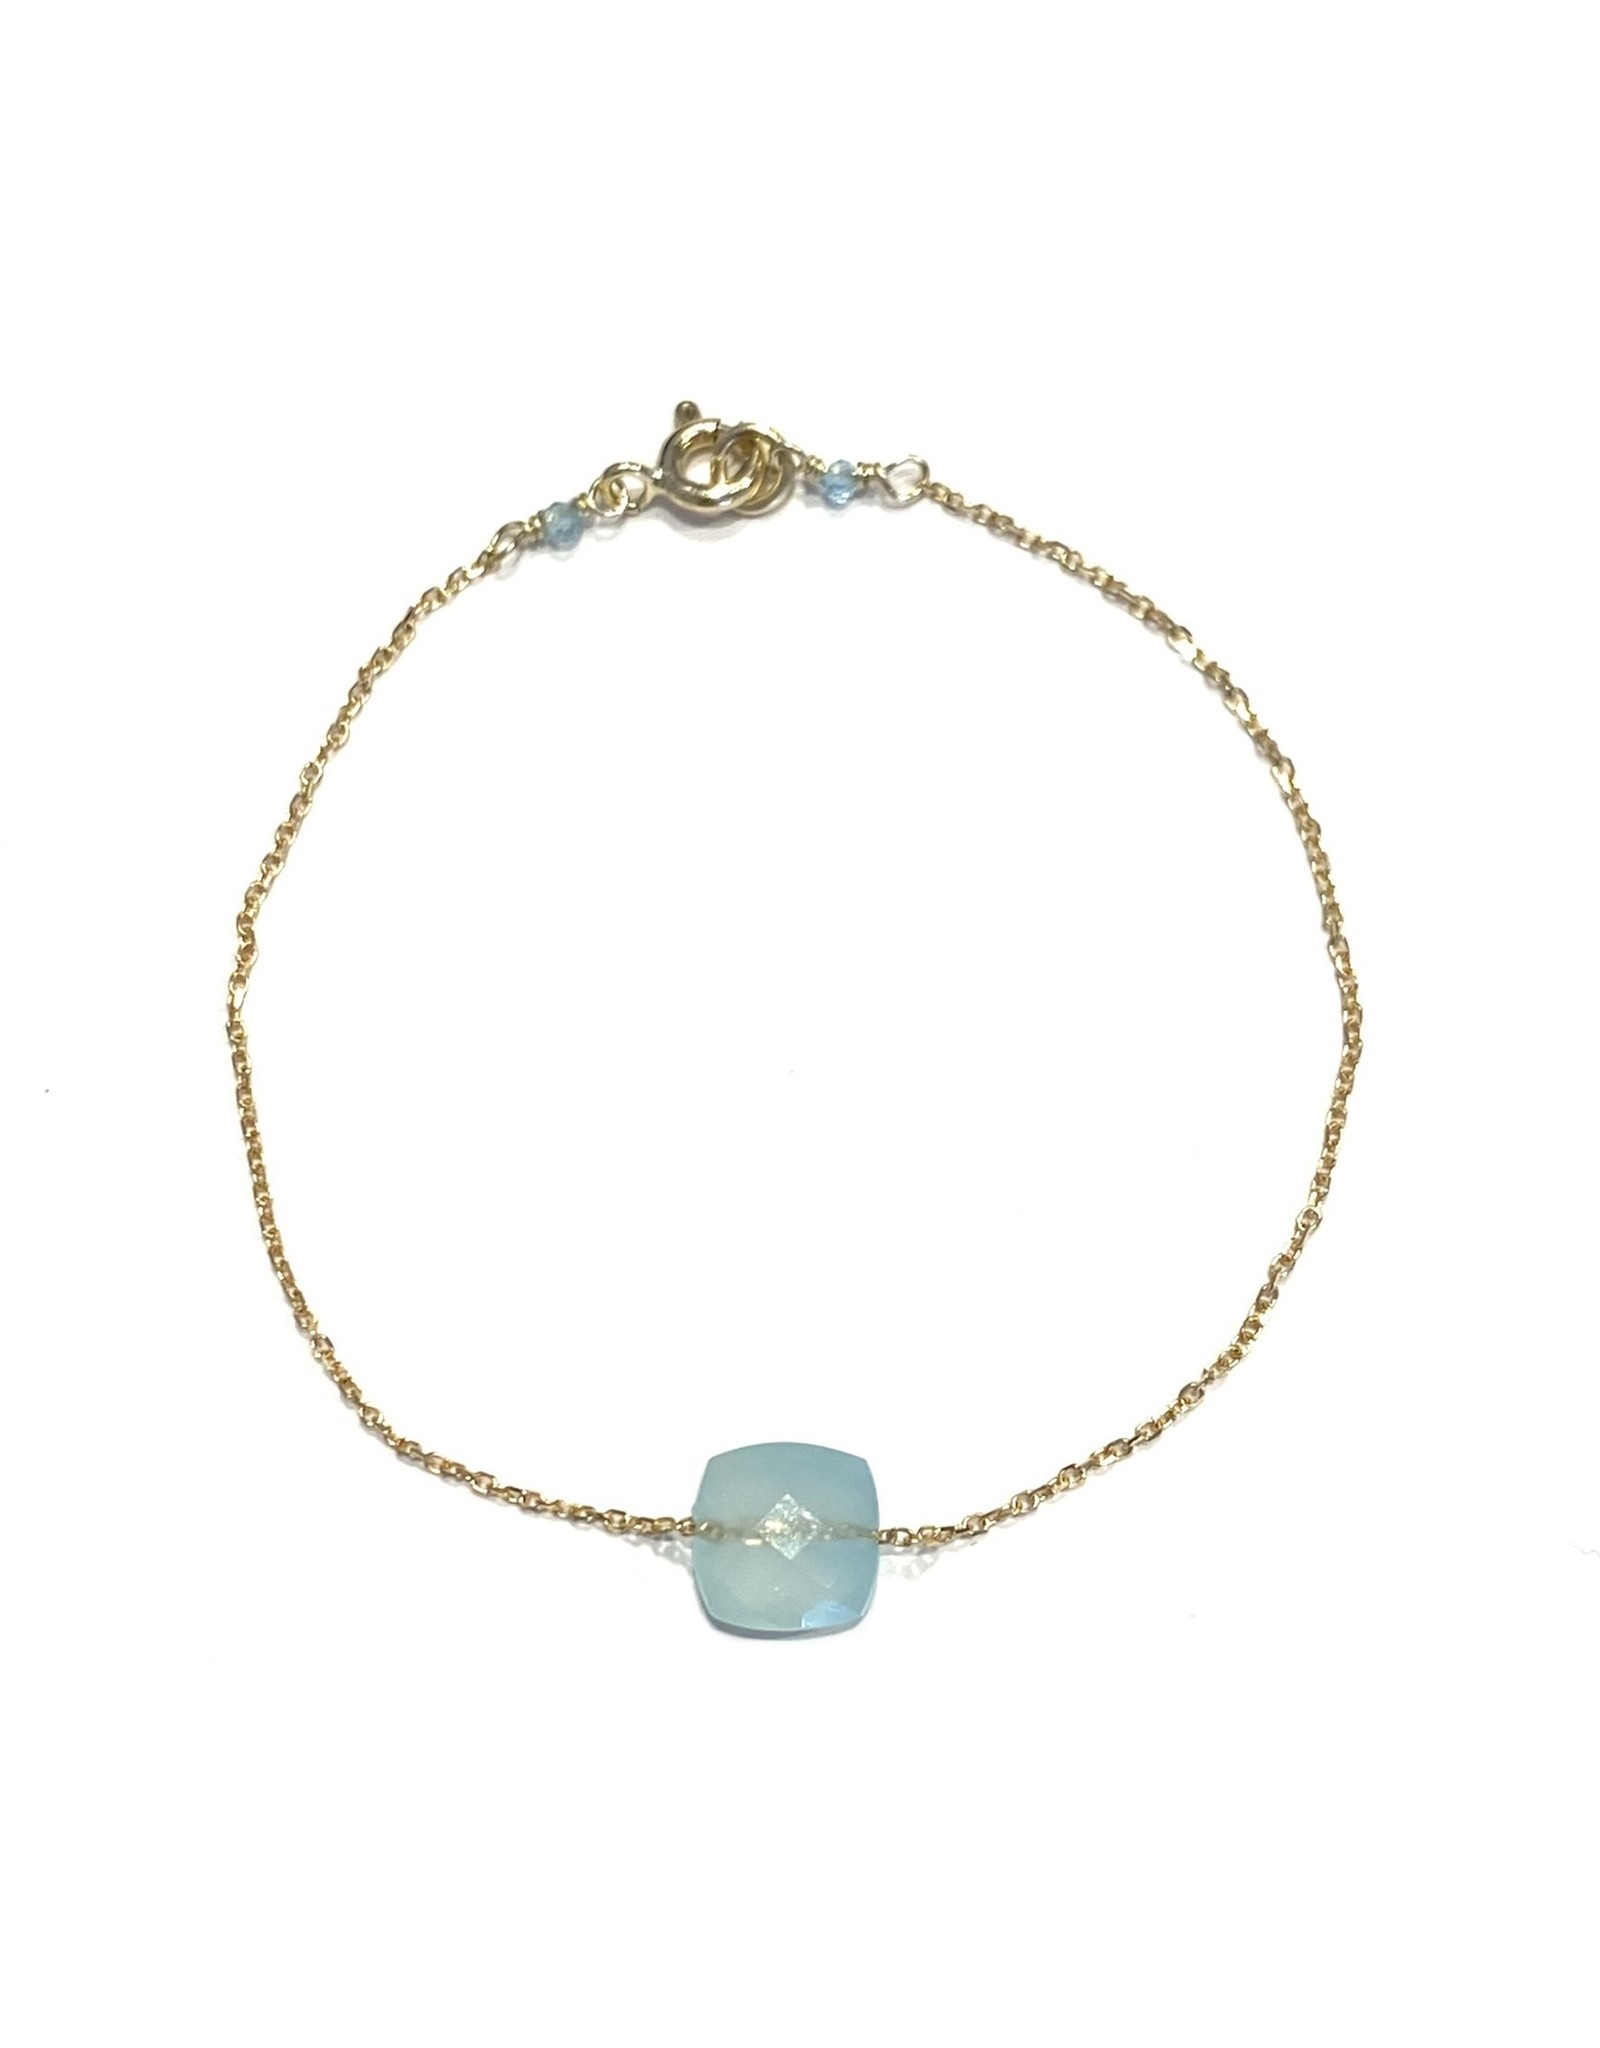 Bo Gold Armband - Goud - Edelsteen